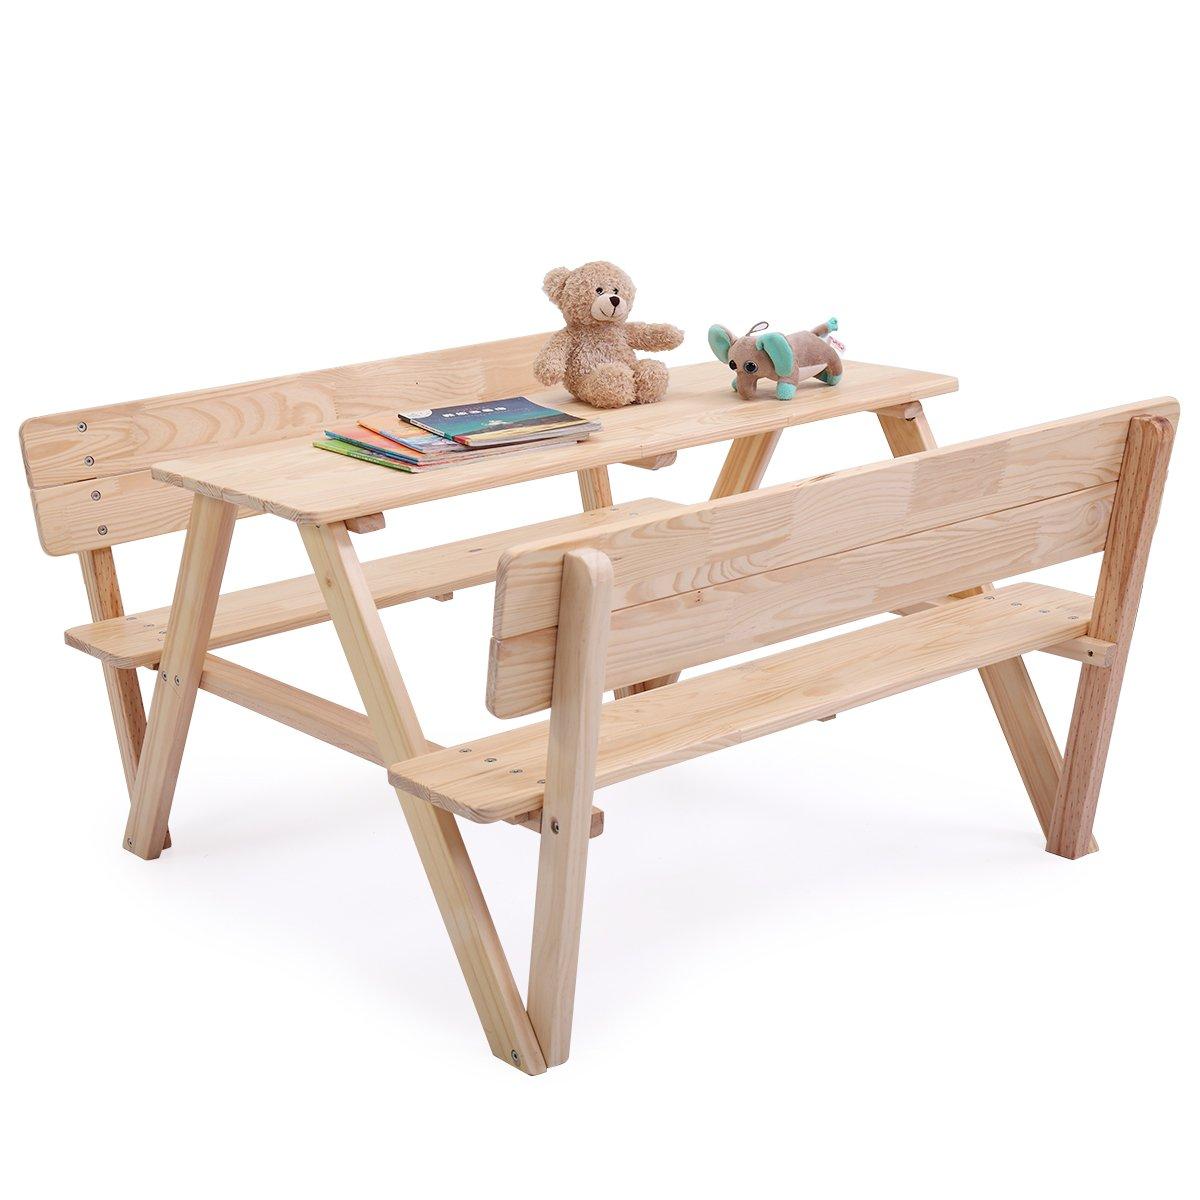 Tobbi Kids Table Bench Set Children Wooden Picnic Bench Play Seat W/Backrest